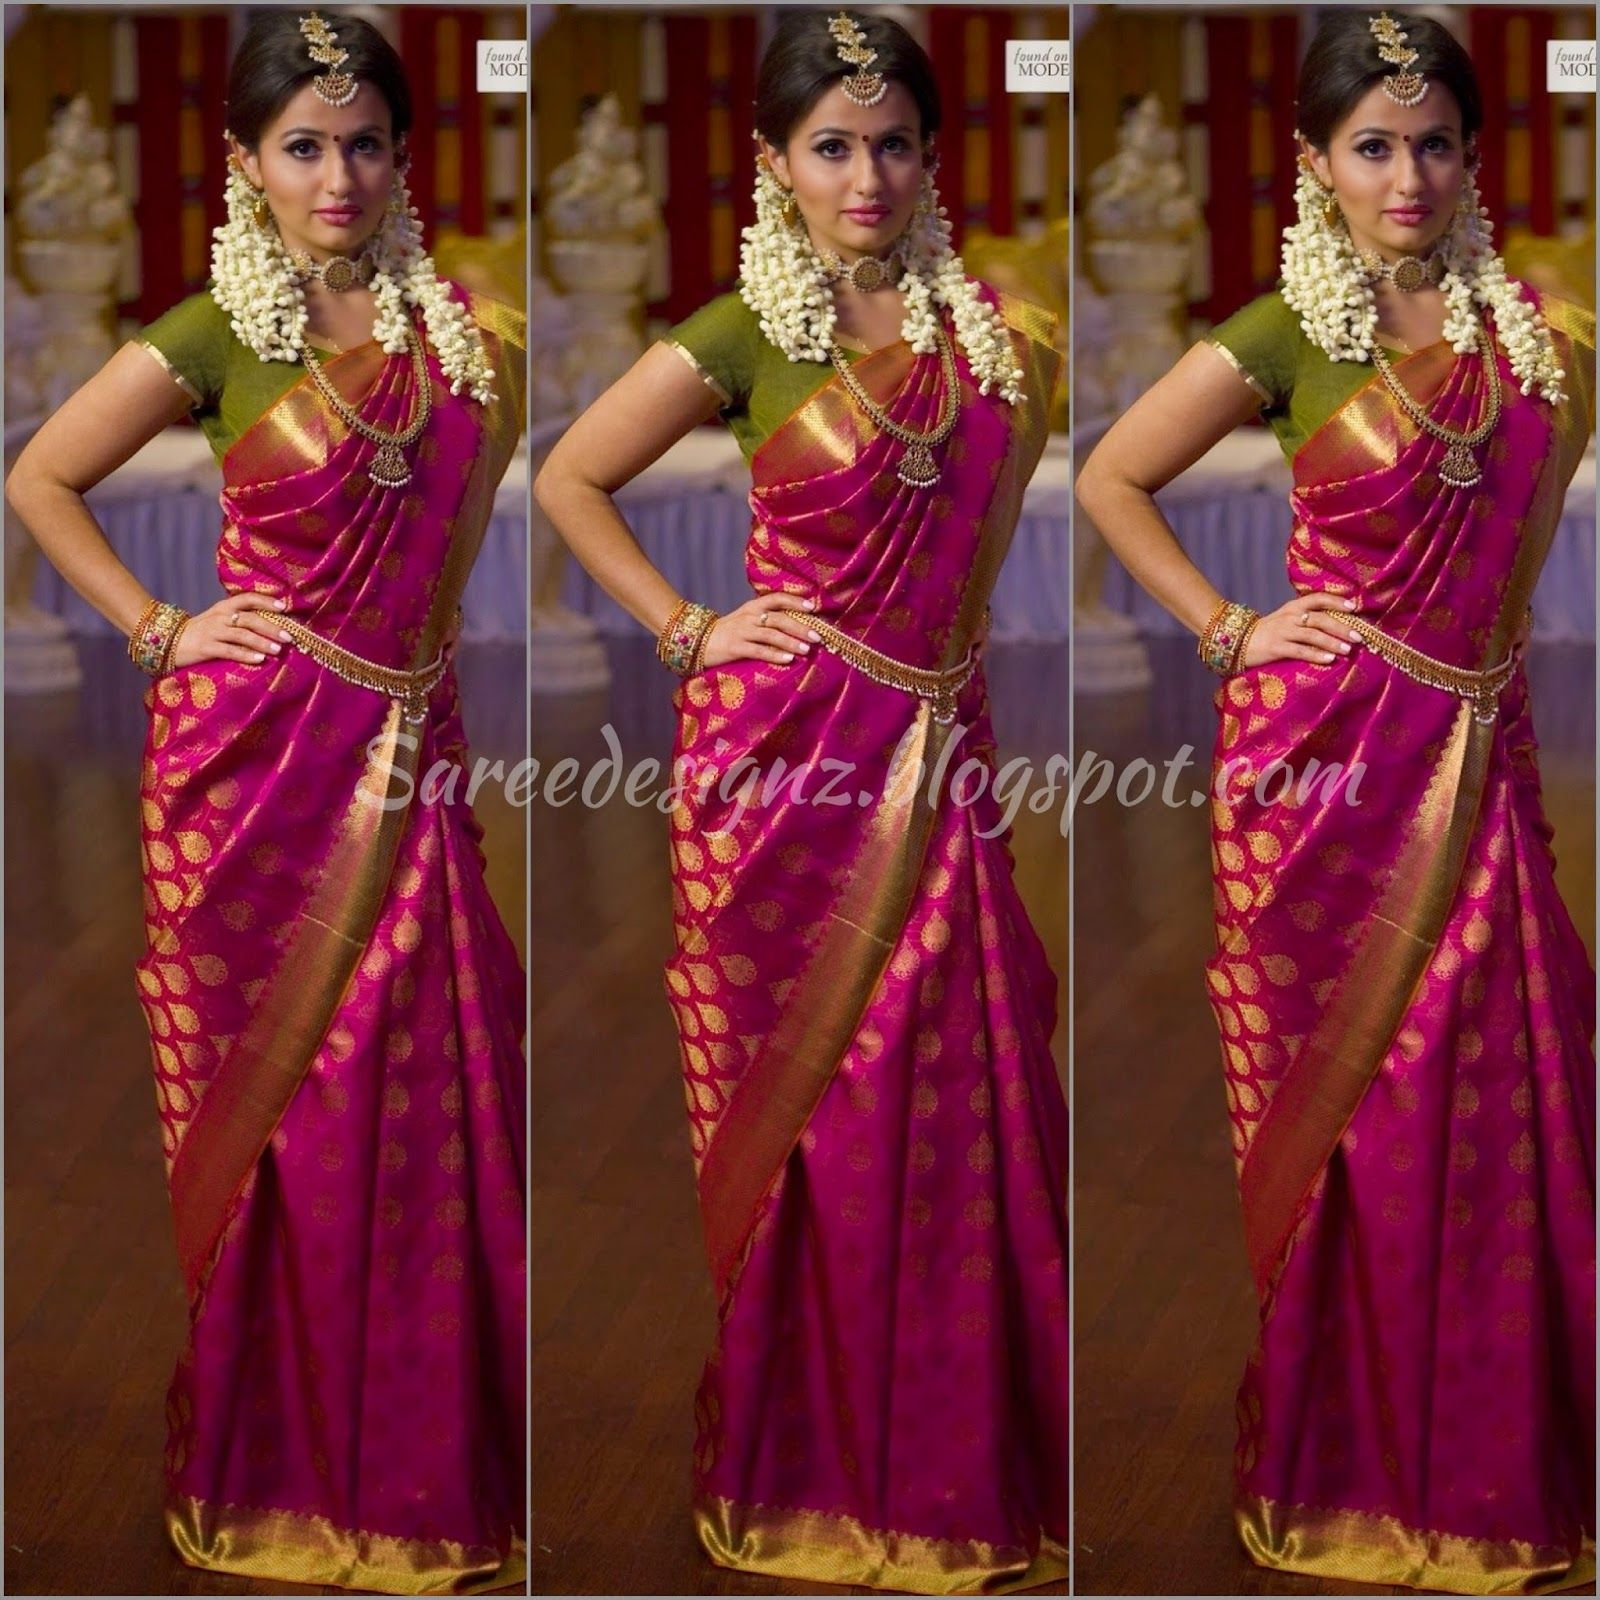 Pranitha At VRK Silks Brides From Around The World